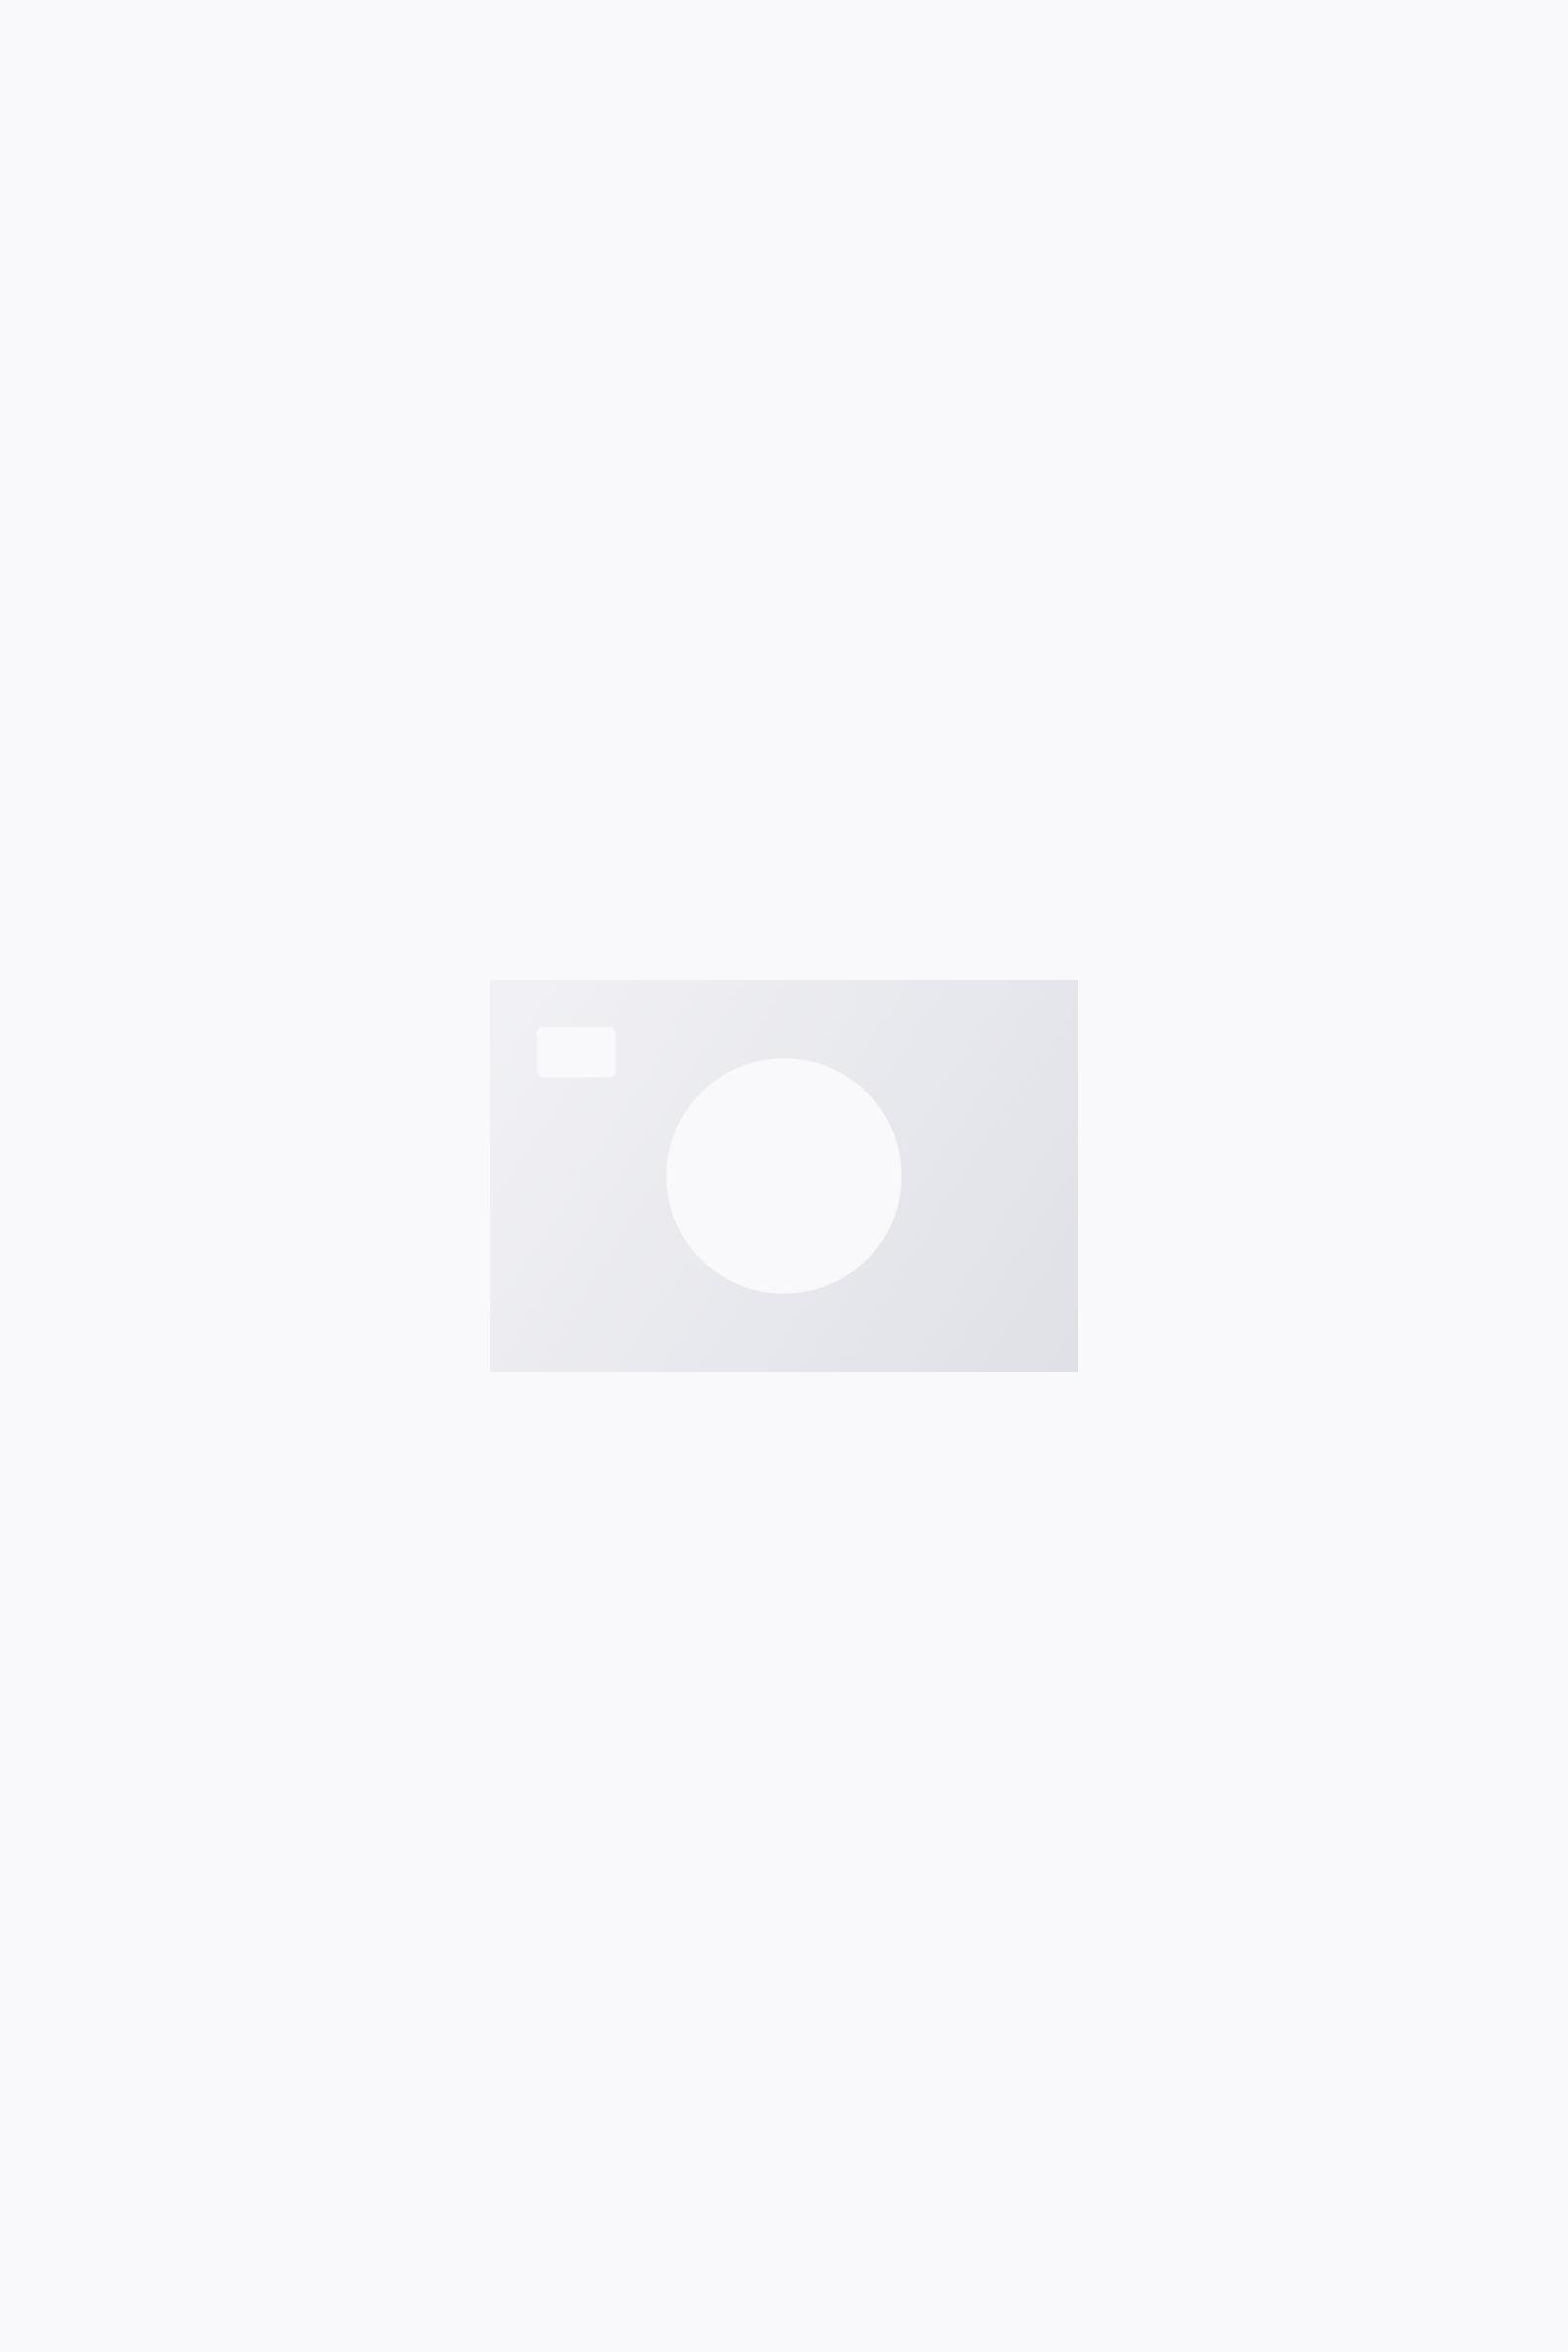 COS REGULAR-FIT BRUSHED COTTON T-SHIRT,mole grey